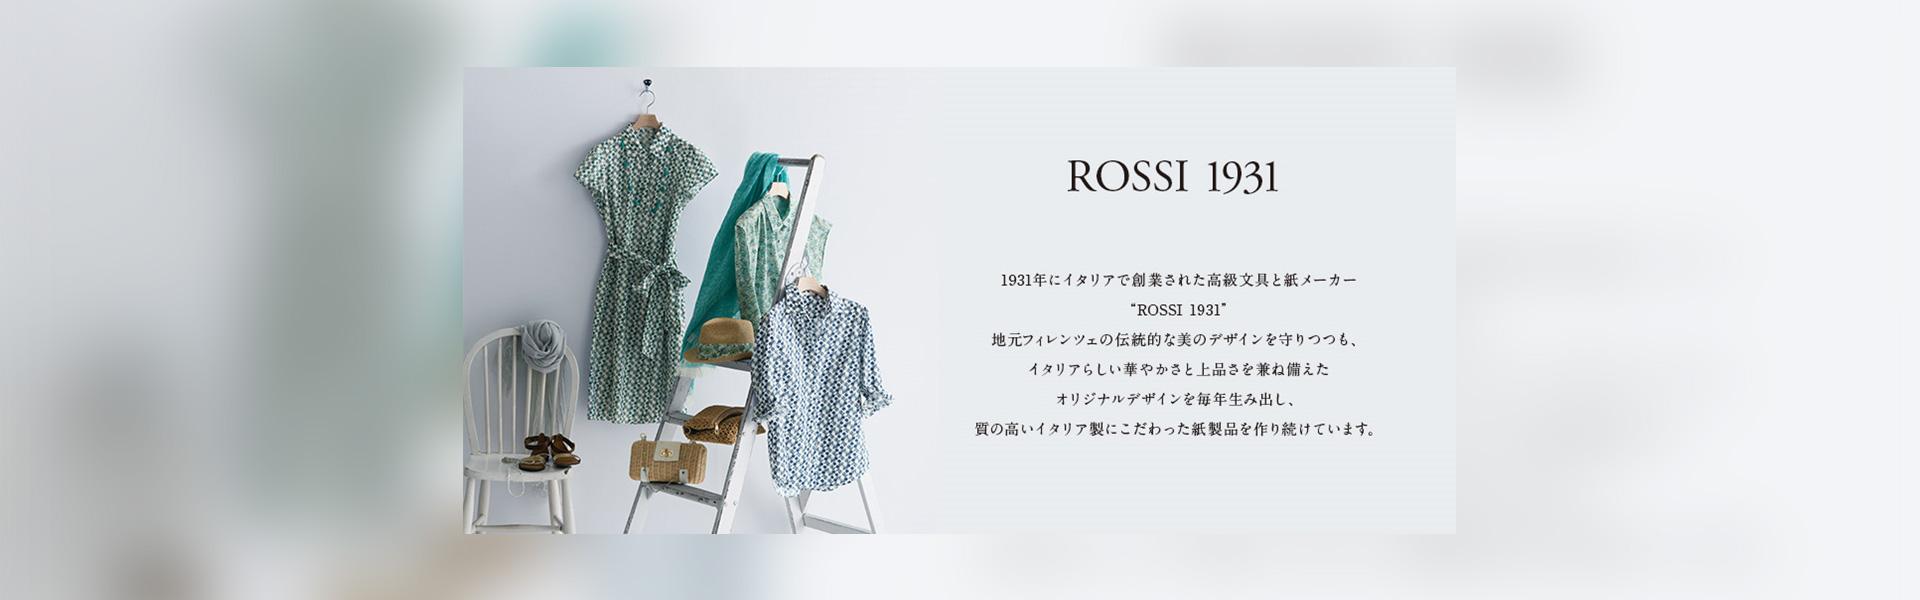 Japanese-women-brand-amaca-rossi1931-partnership